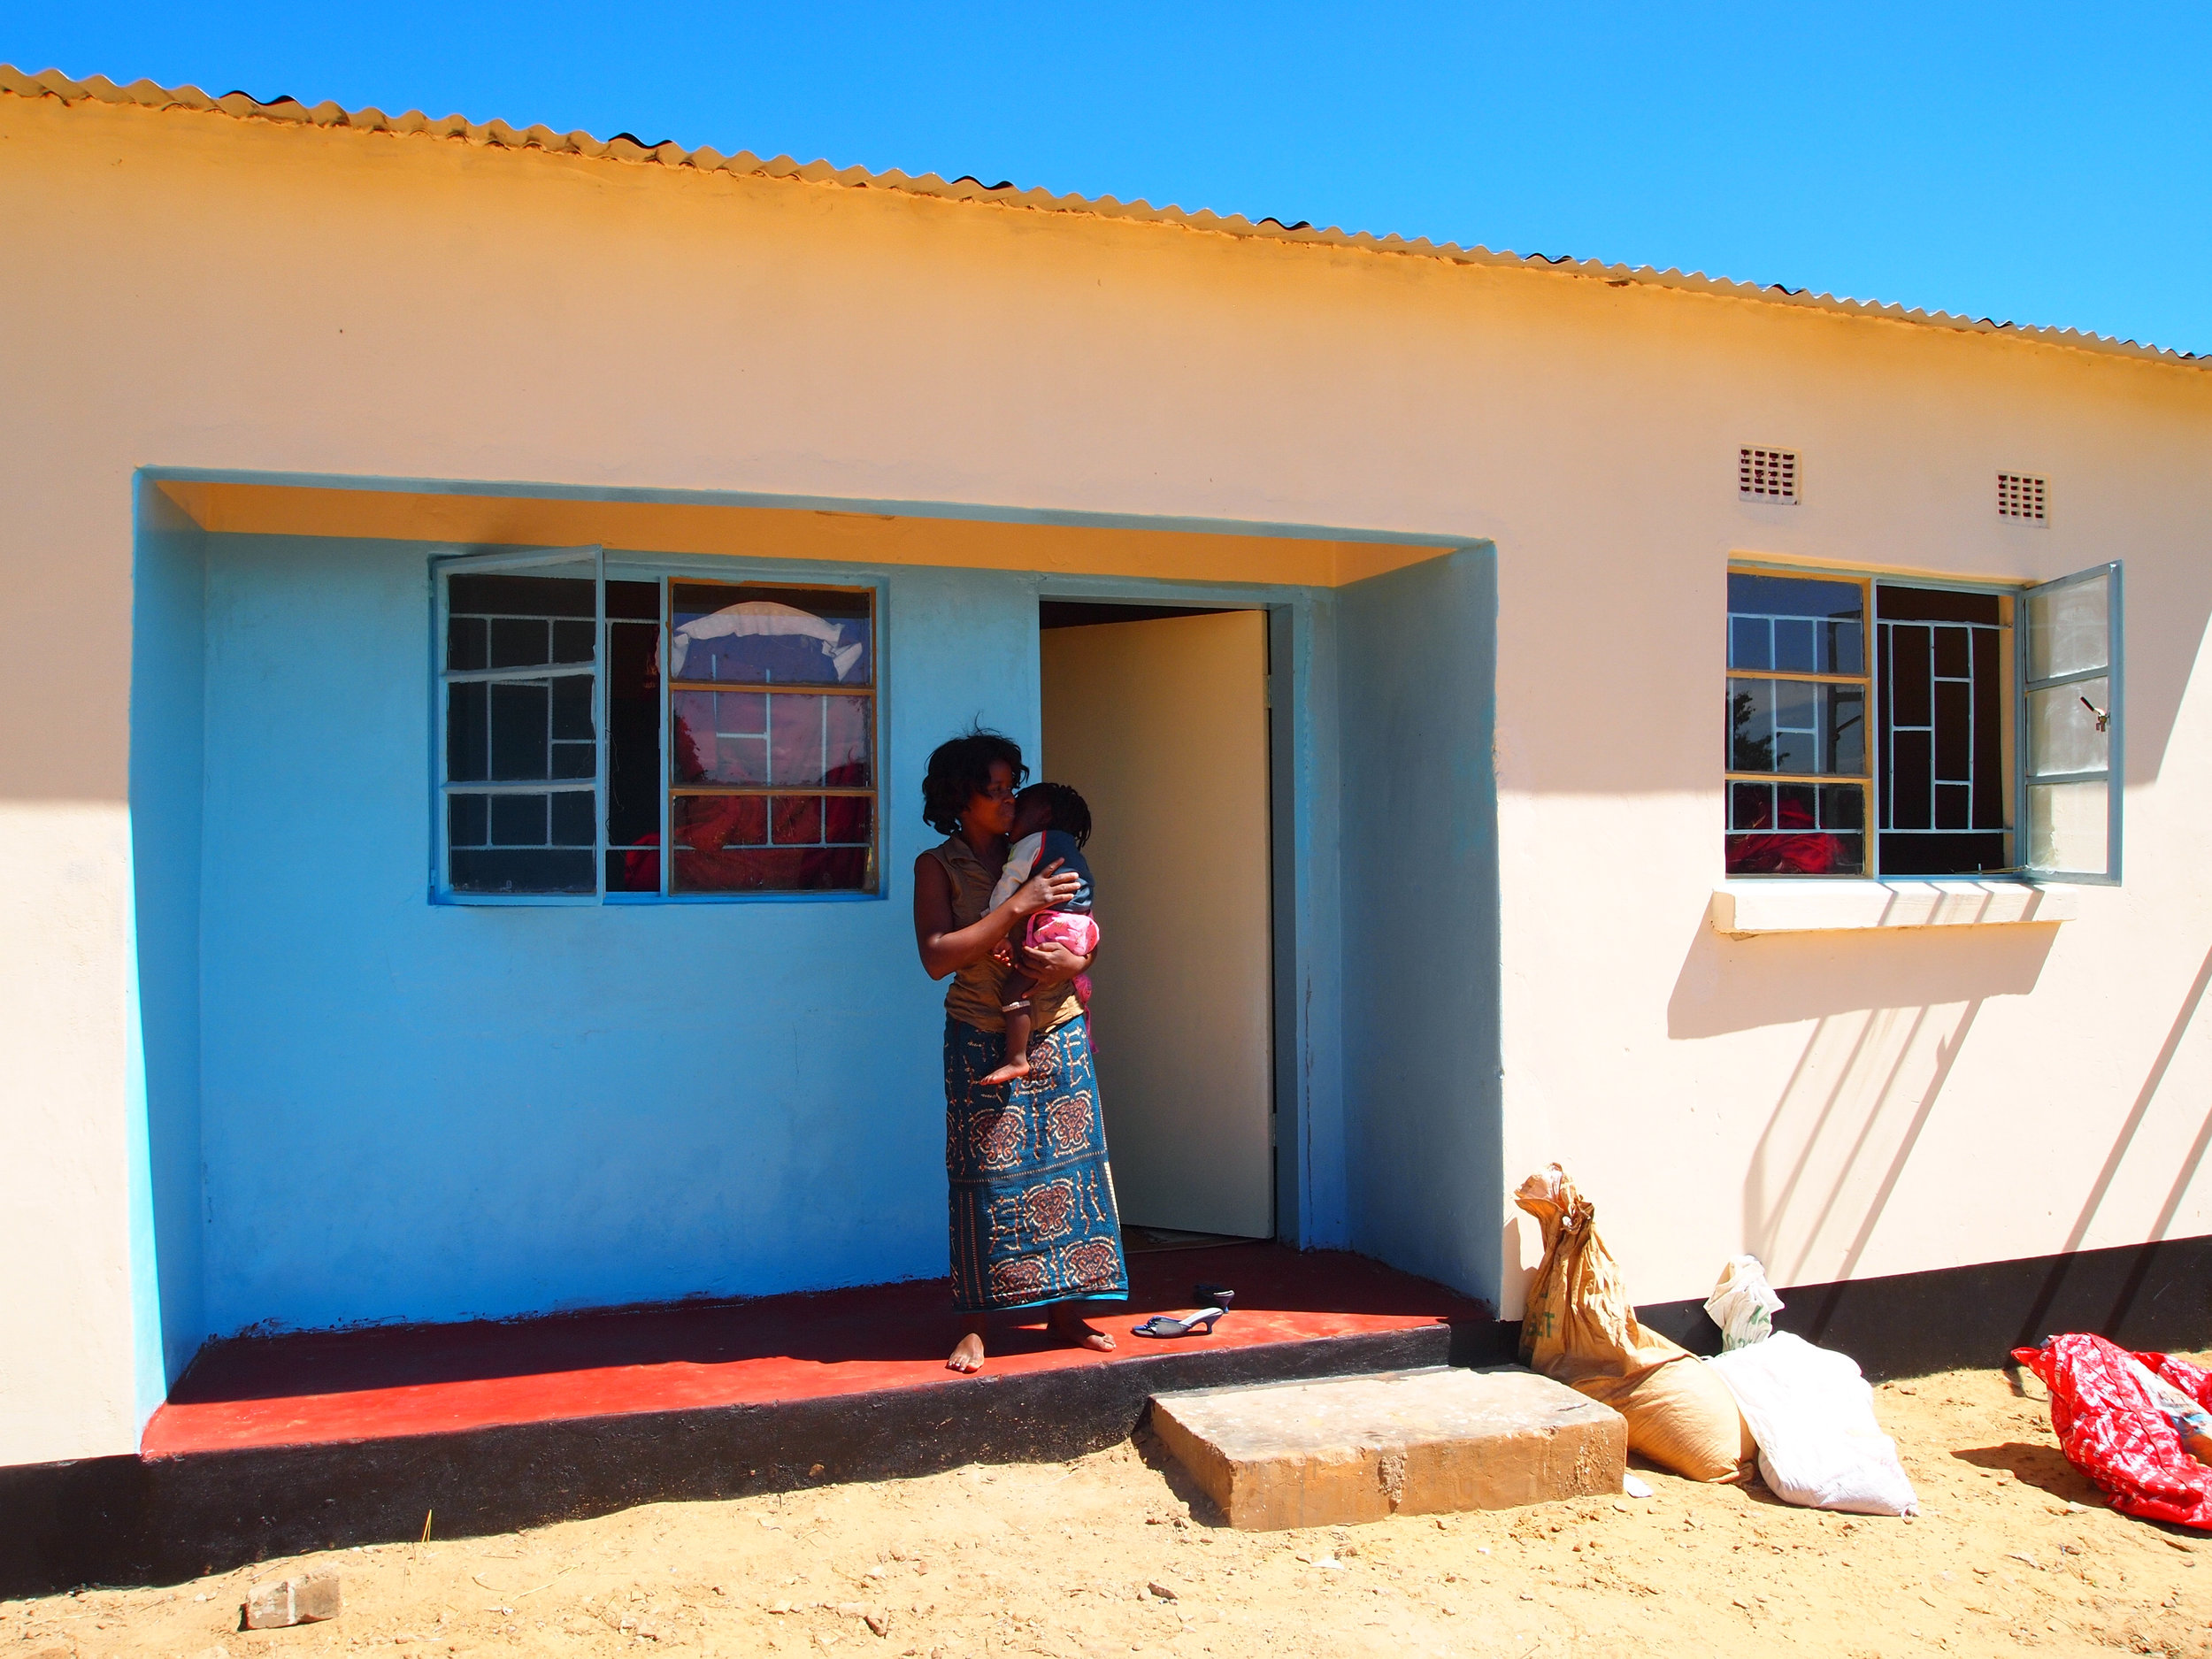 Terraced houses for teachers build by ZEEC